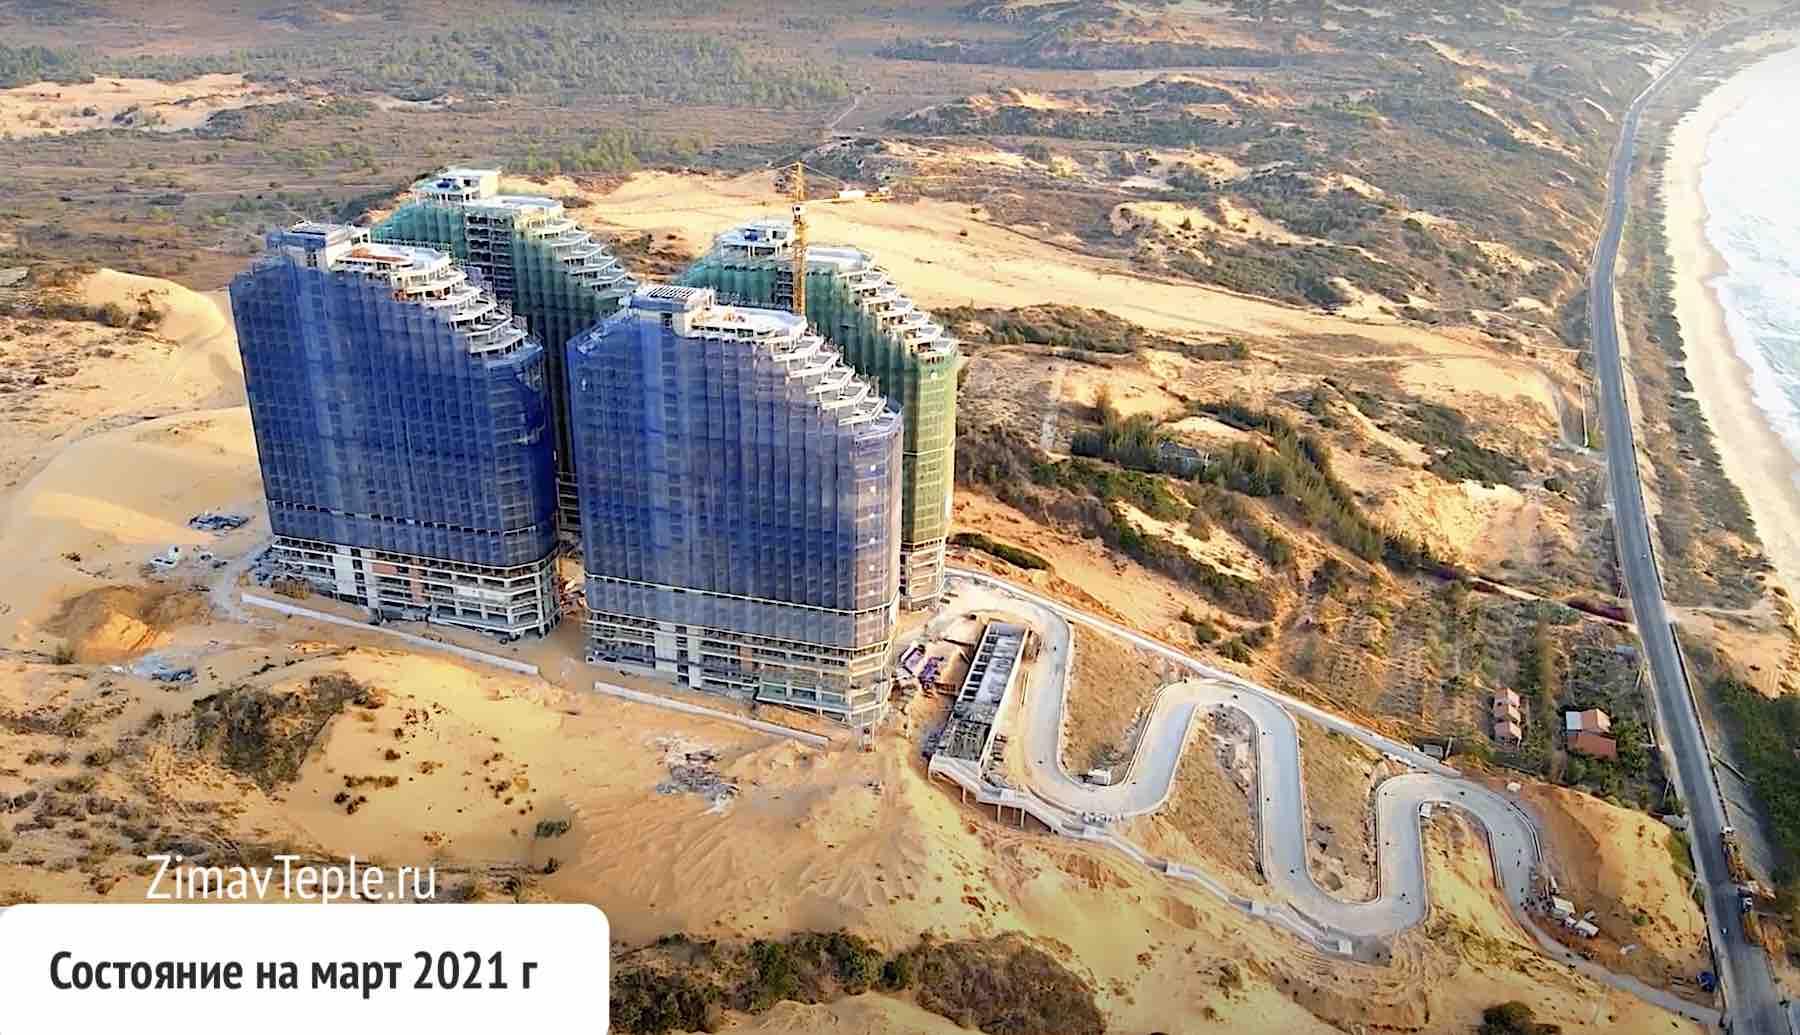 Прогресс строительства объекта APEC MANDALA WYNDHAM на курорте Муйне